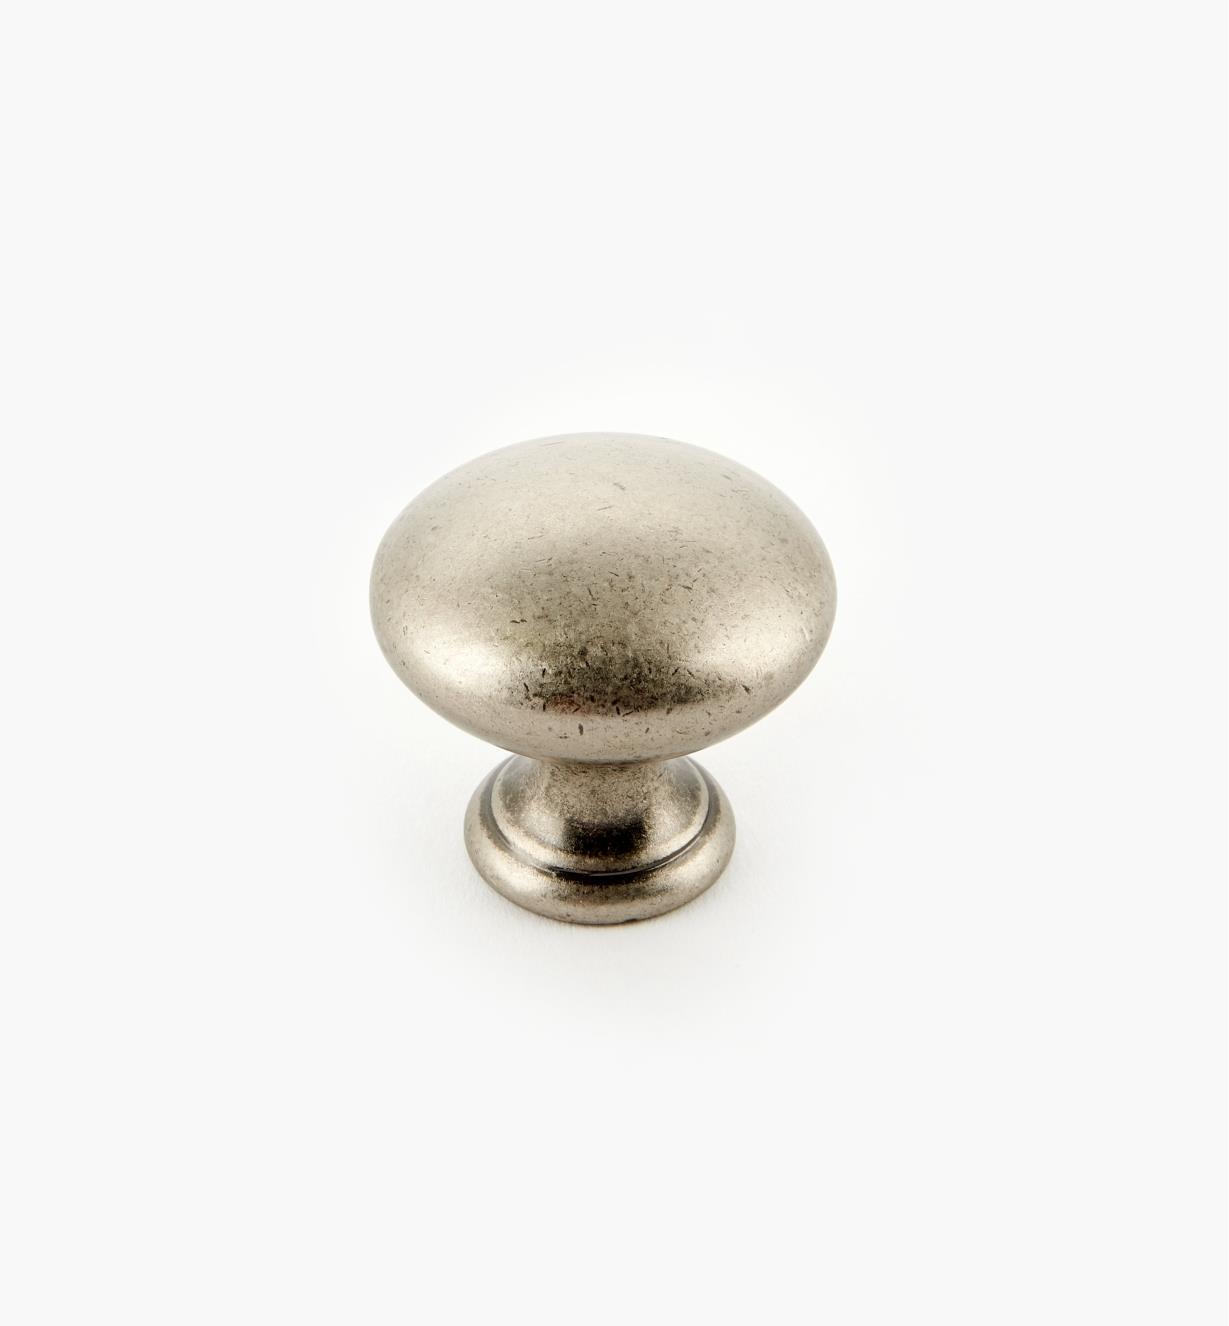 "03W2300 - 1 1/4"" Antique Silver Knob, each"